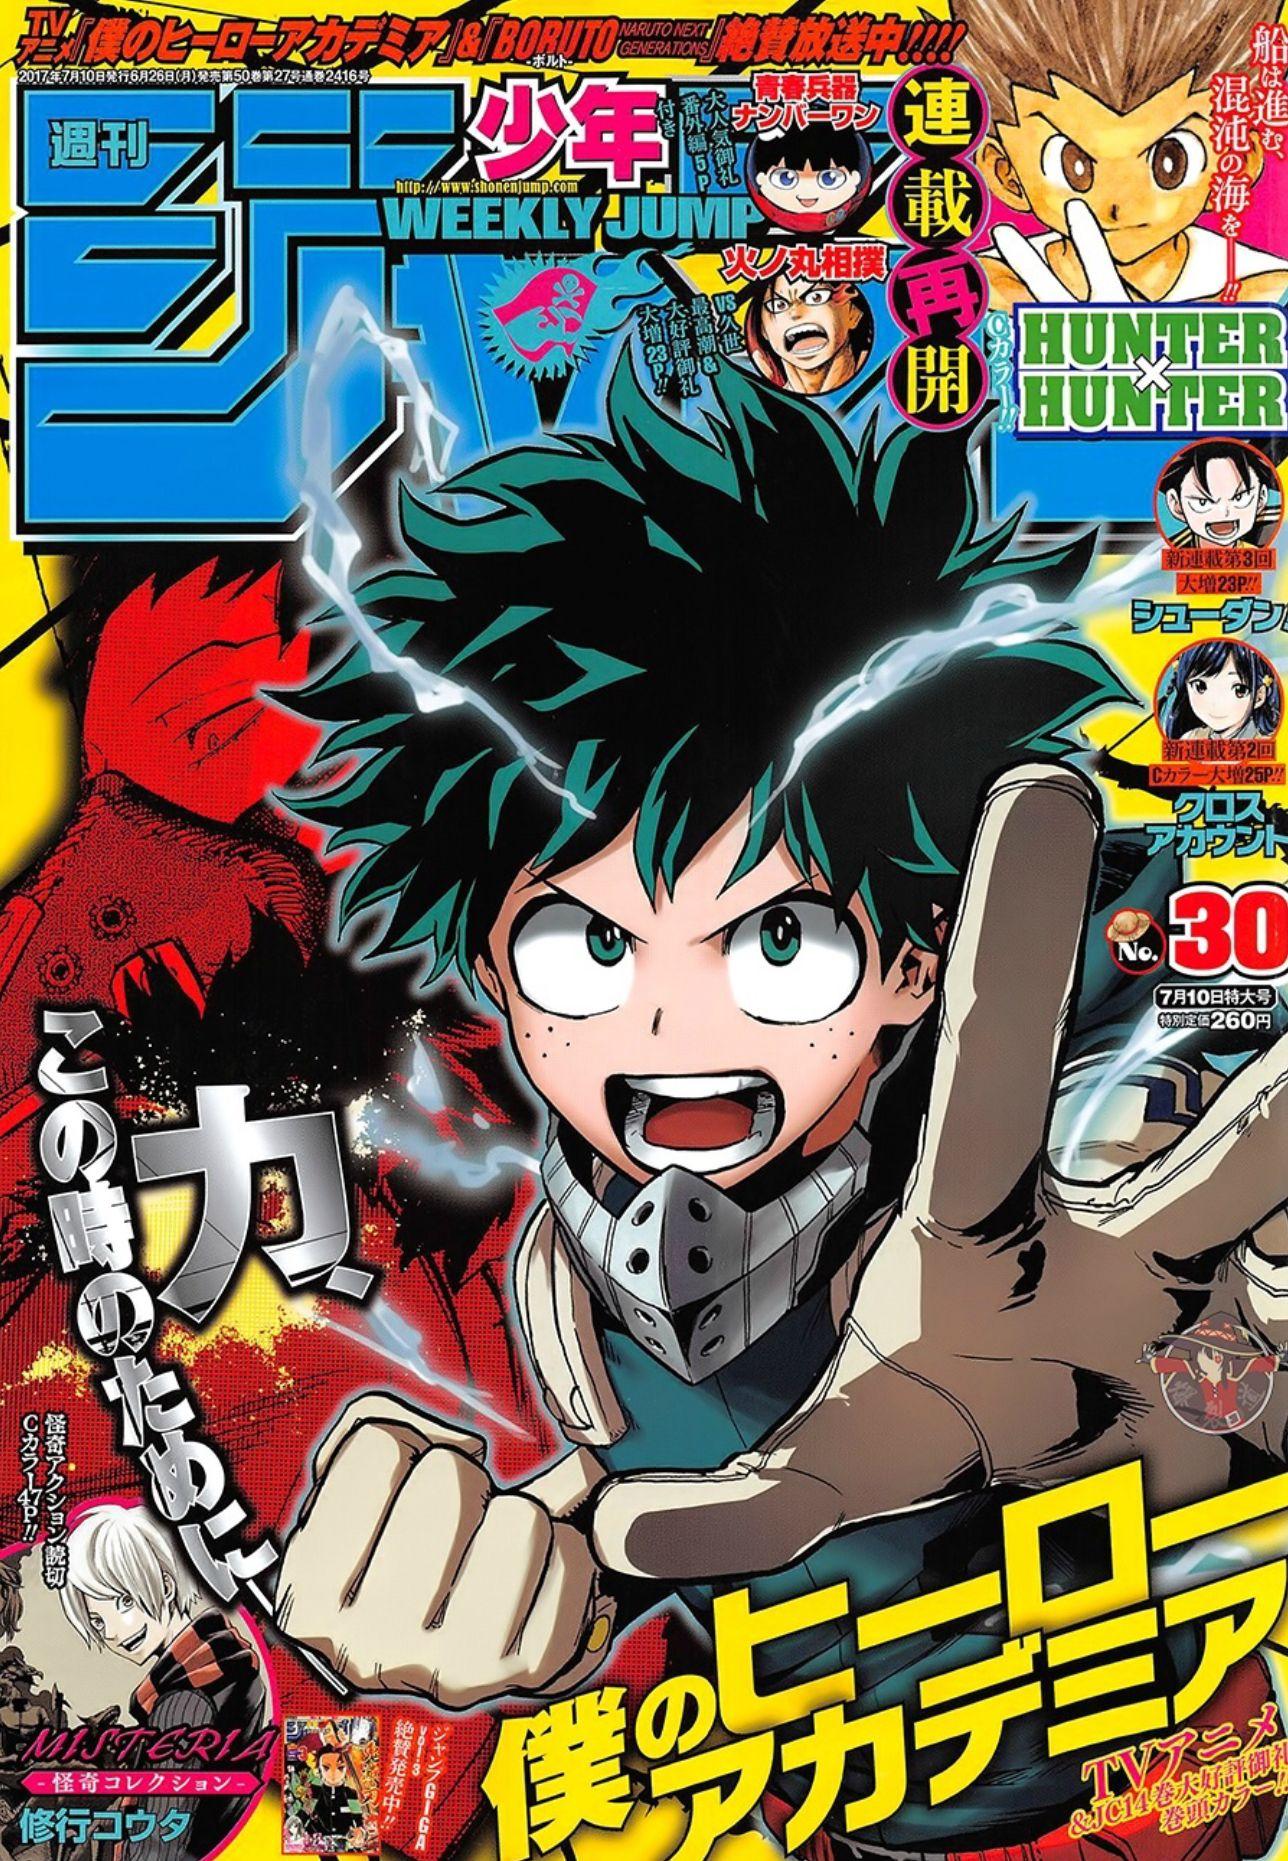 Pin by Shonen Jump Heroes on My Hero Academia Anime